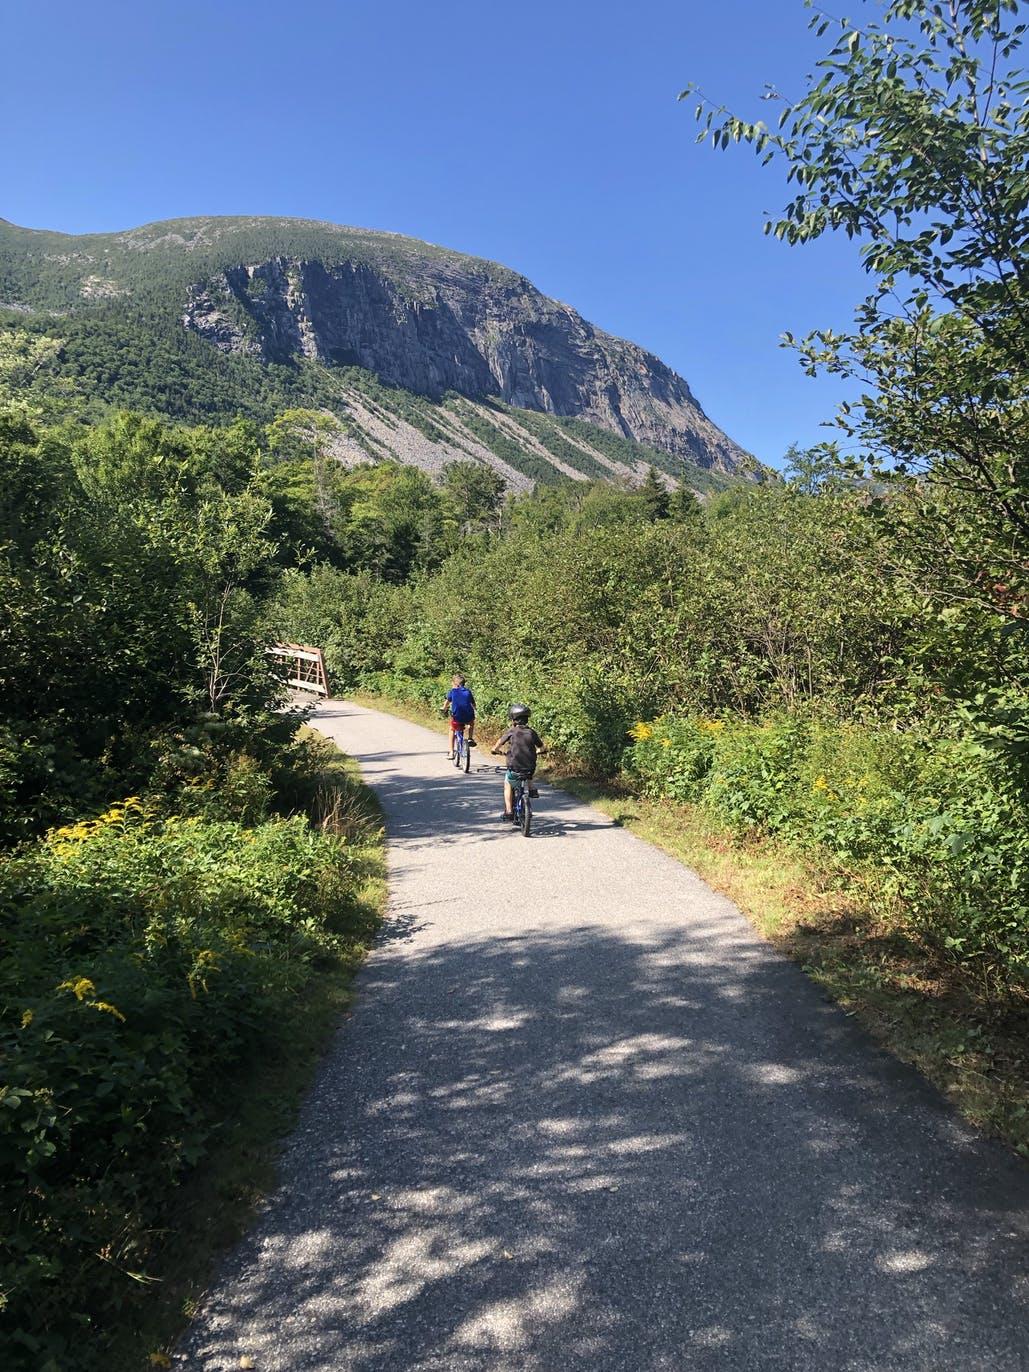 kids riding bikes on path through wilderness